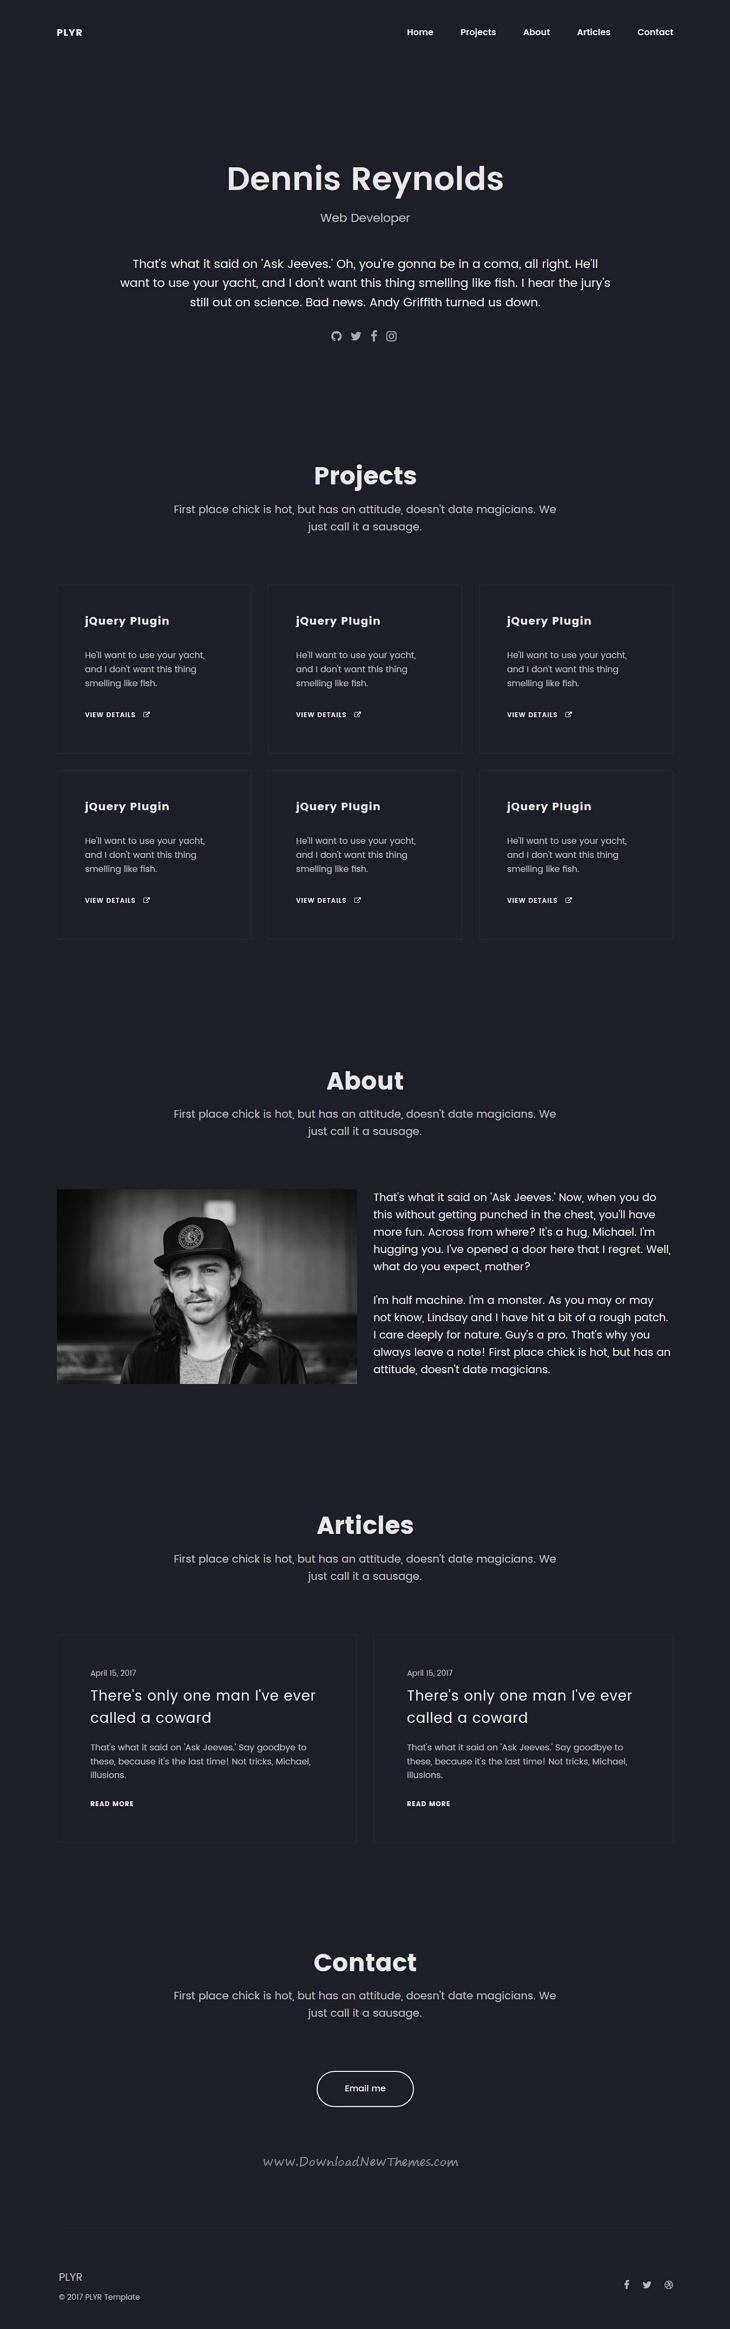 PLYR - One Page Portfolios For Everyone